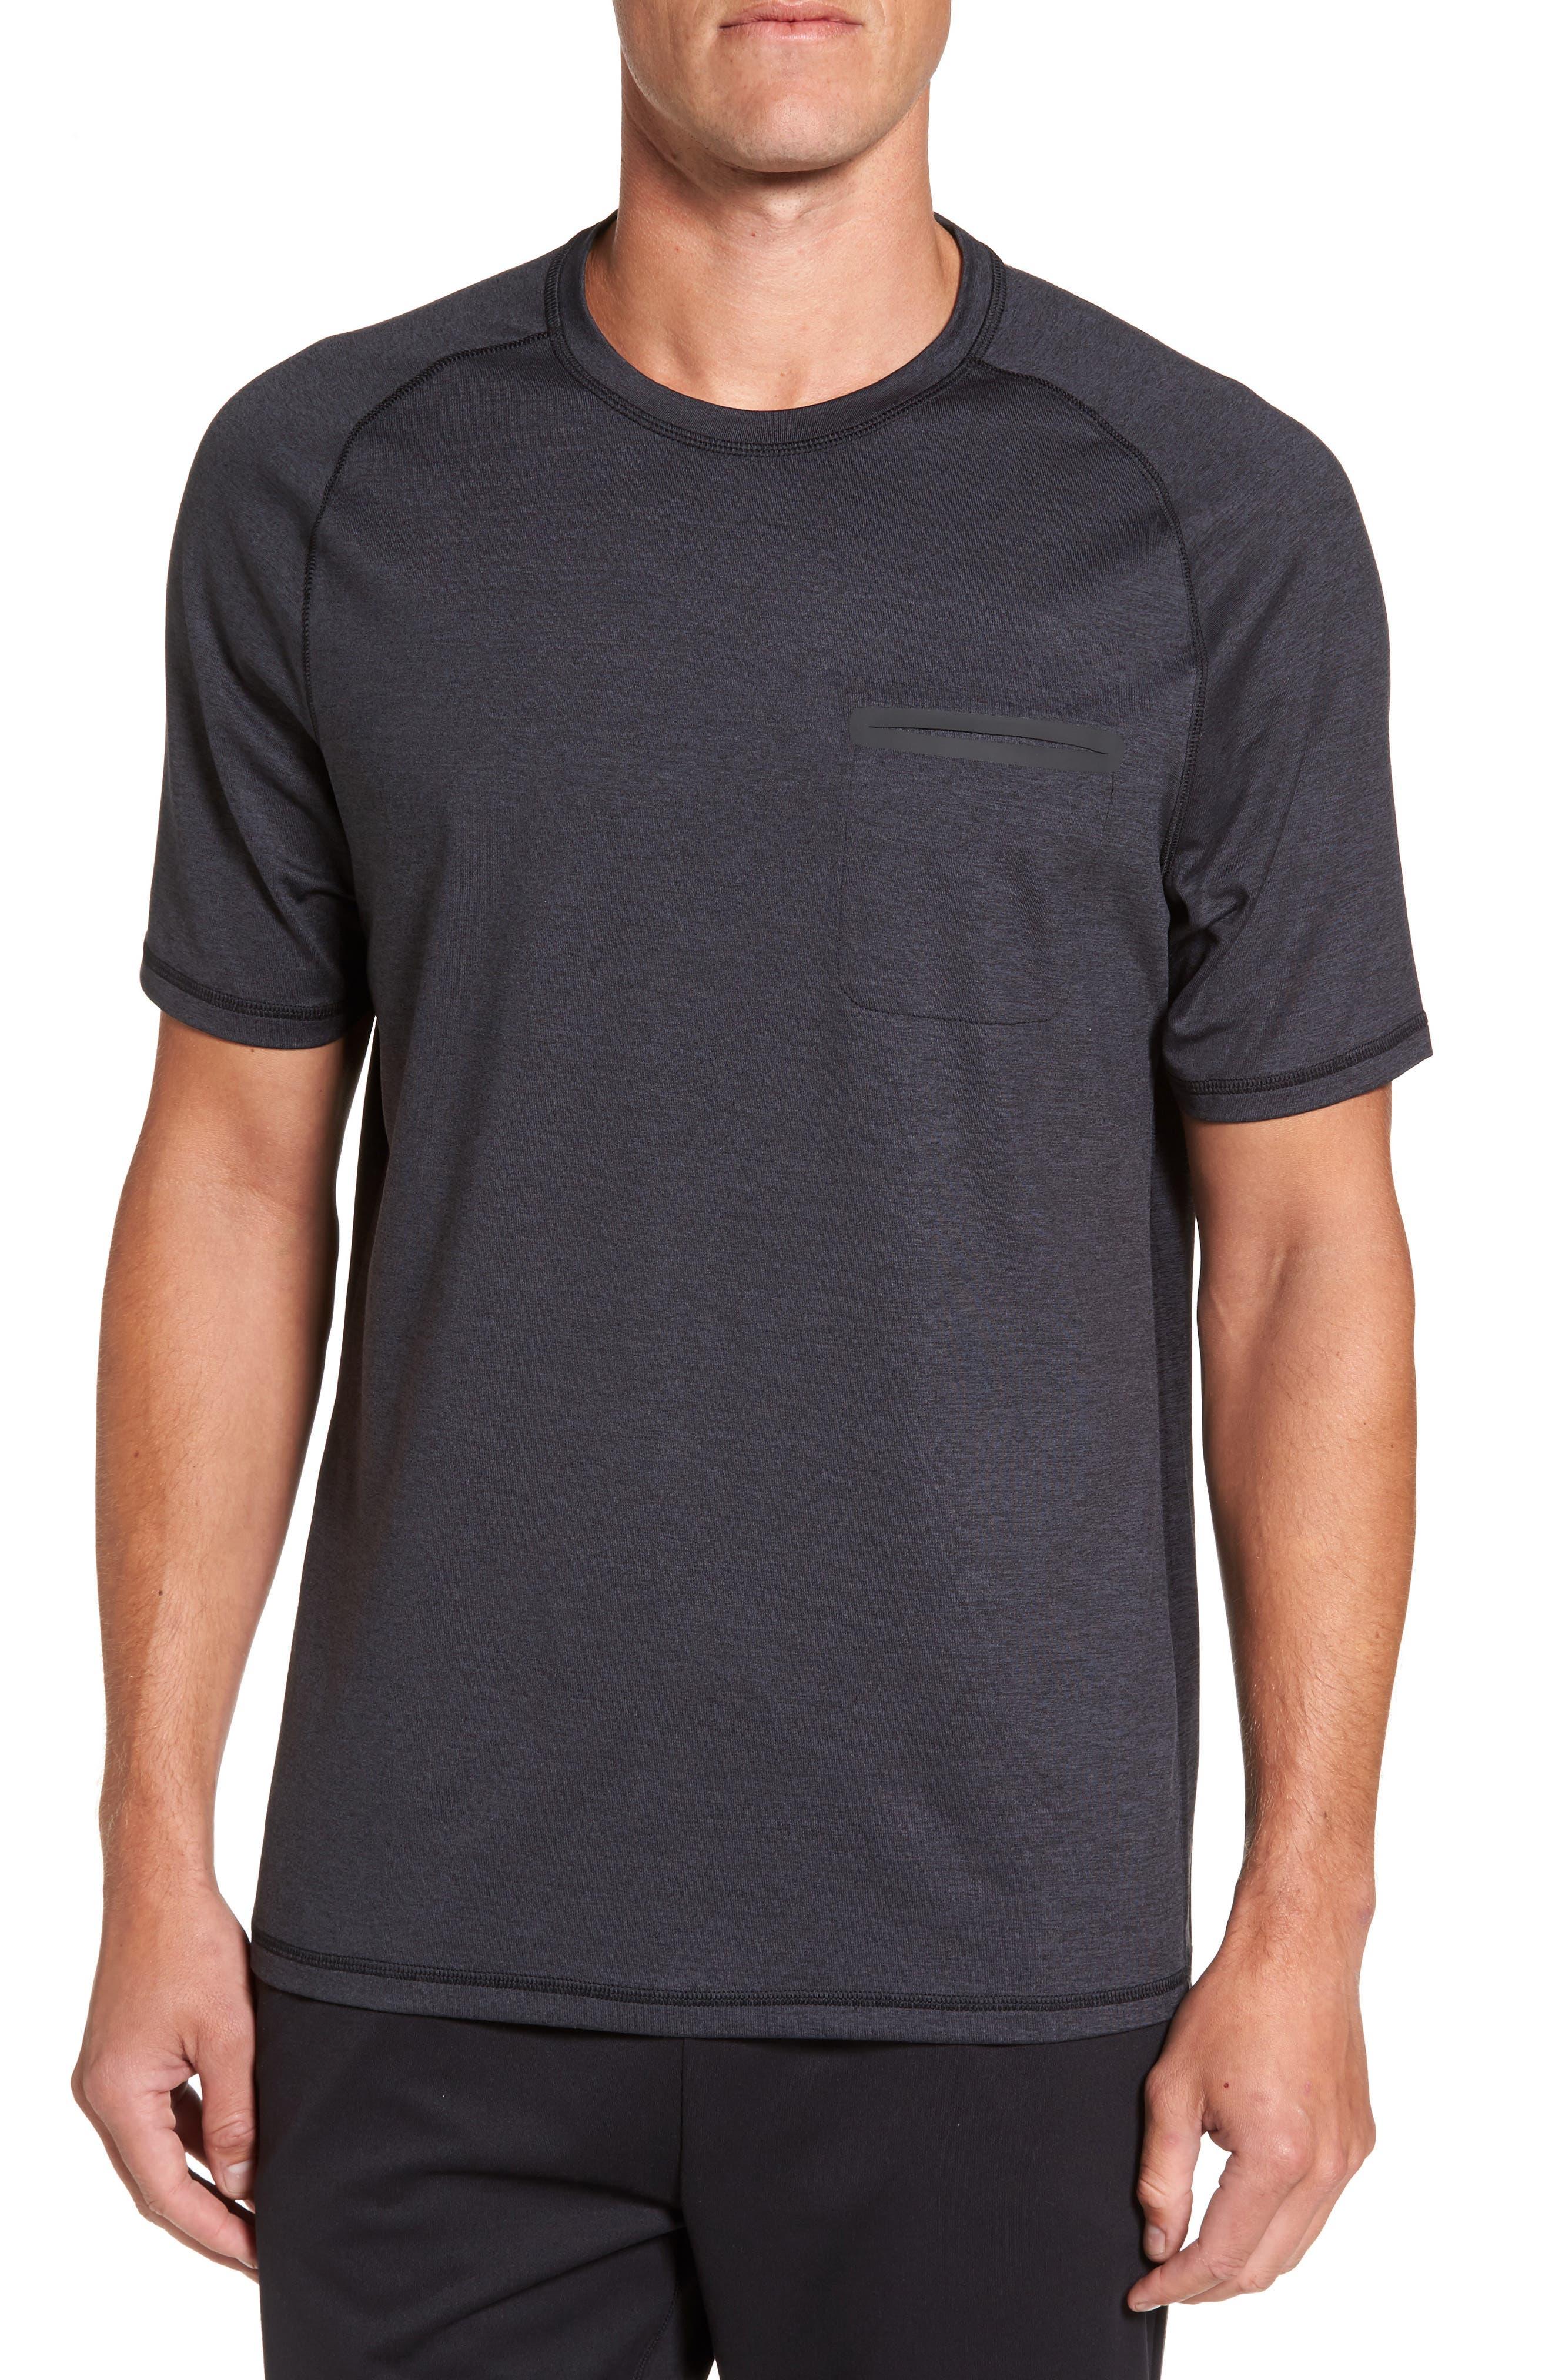 Zella Celsian Moisture Wicking Pocket T-Shirt